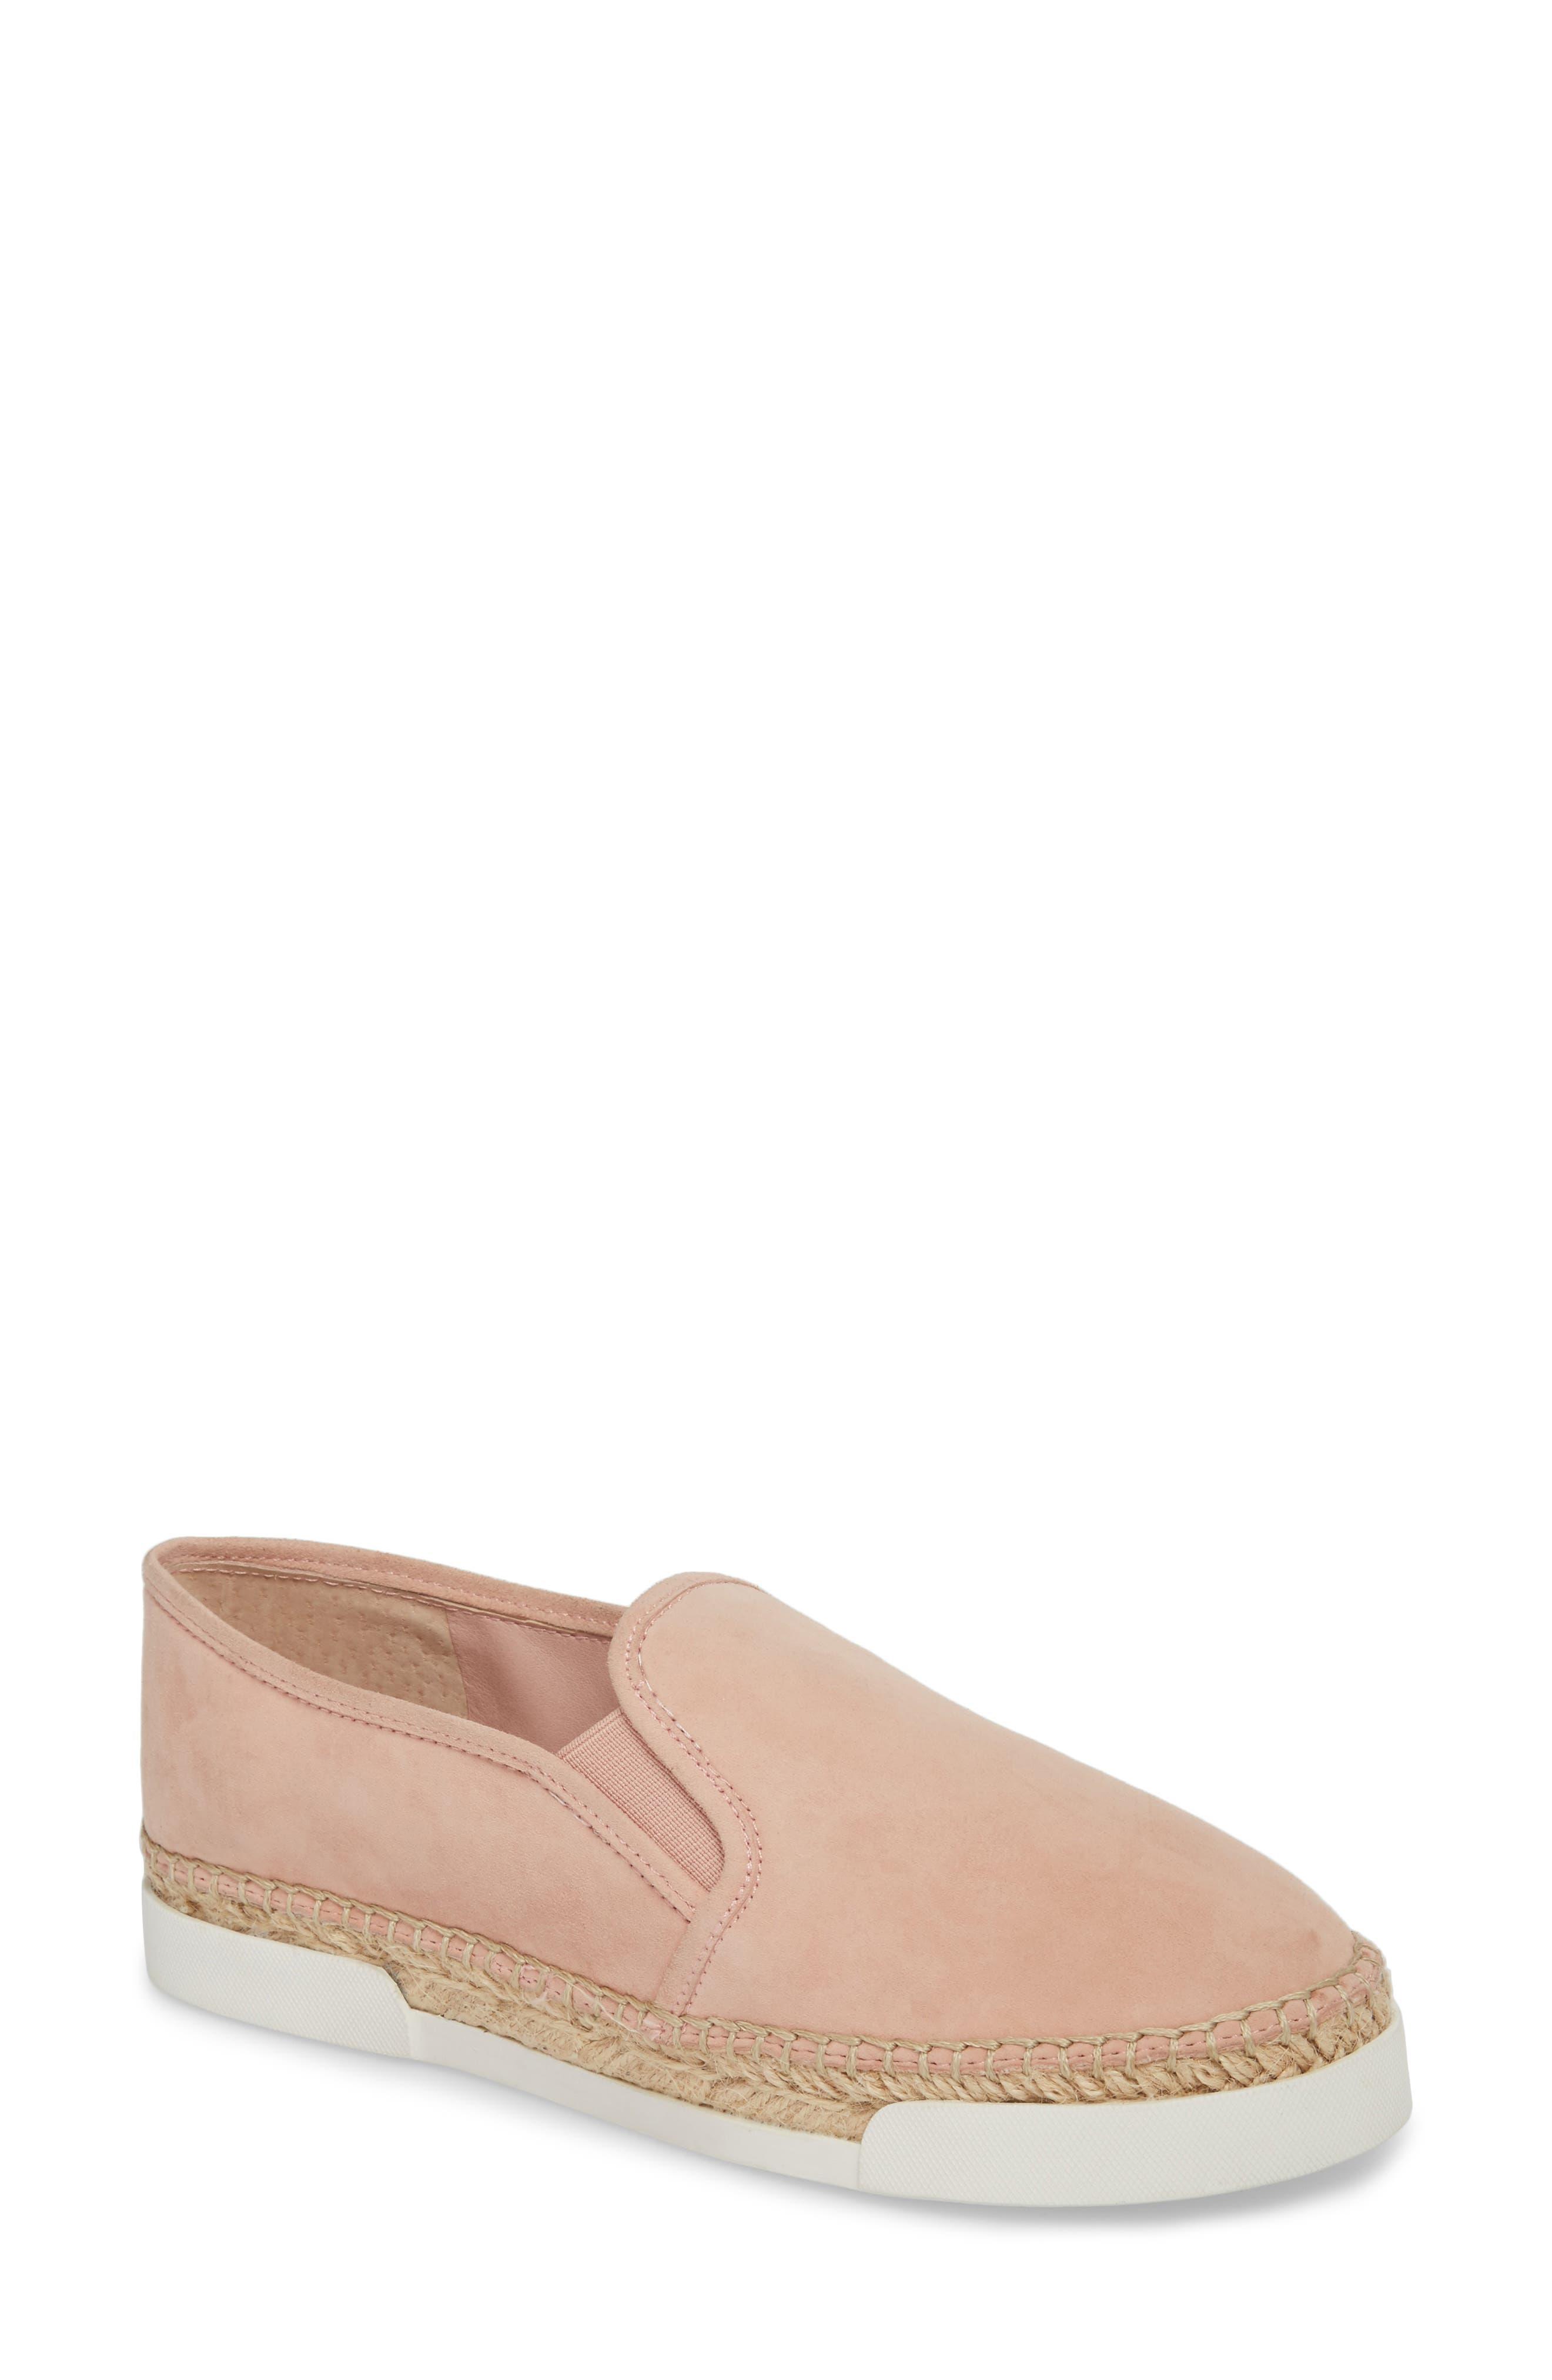 Vince Camuto Tambie Slip-On Sneaker (Women) GvI4P